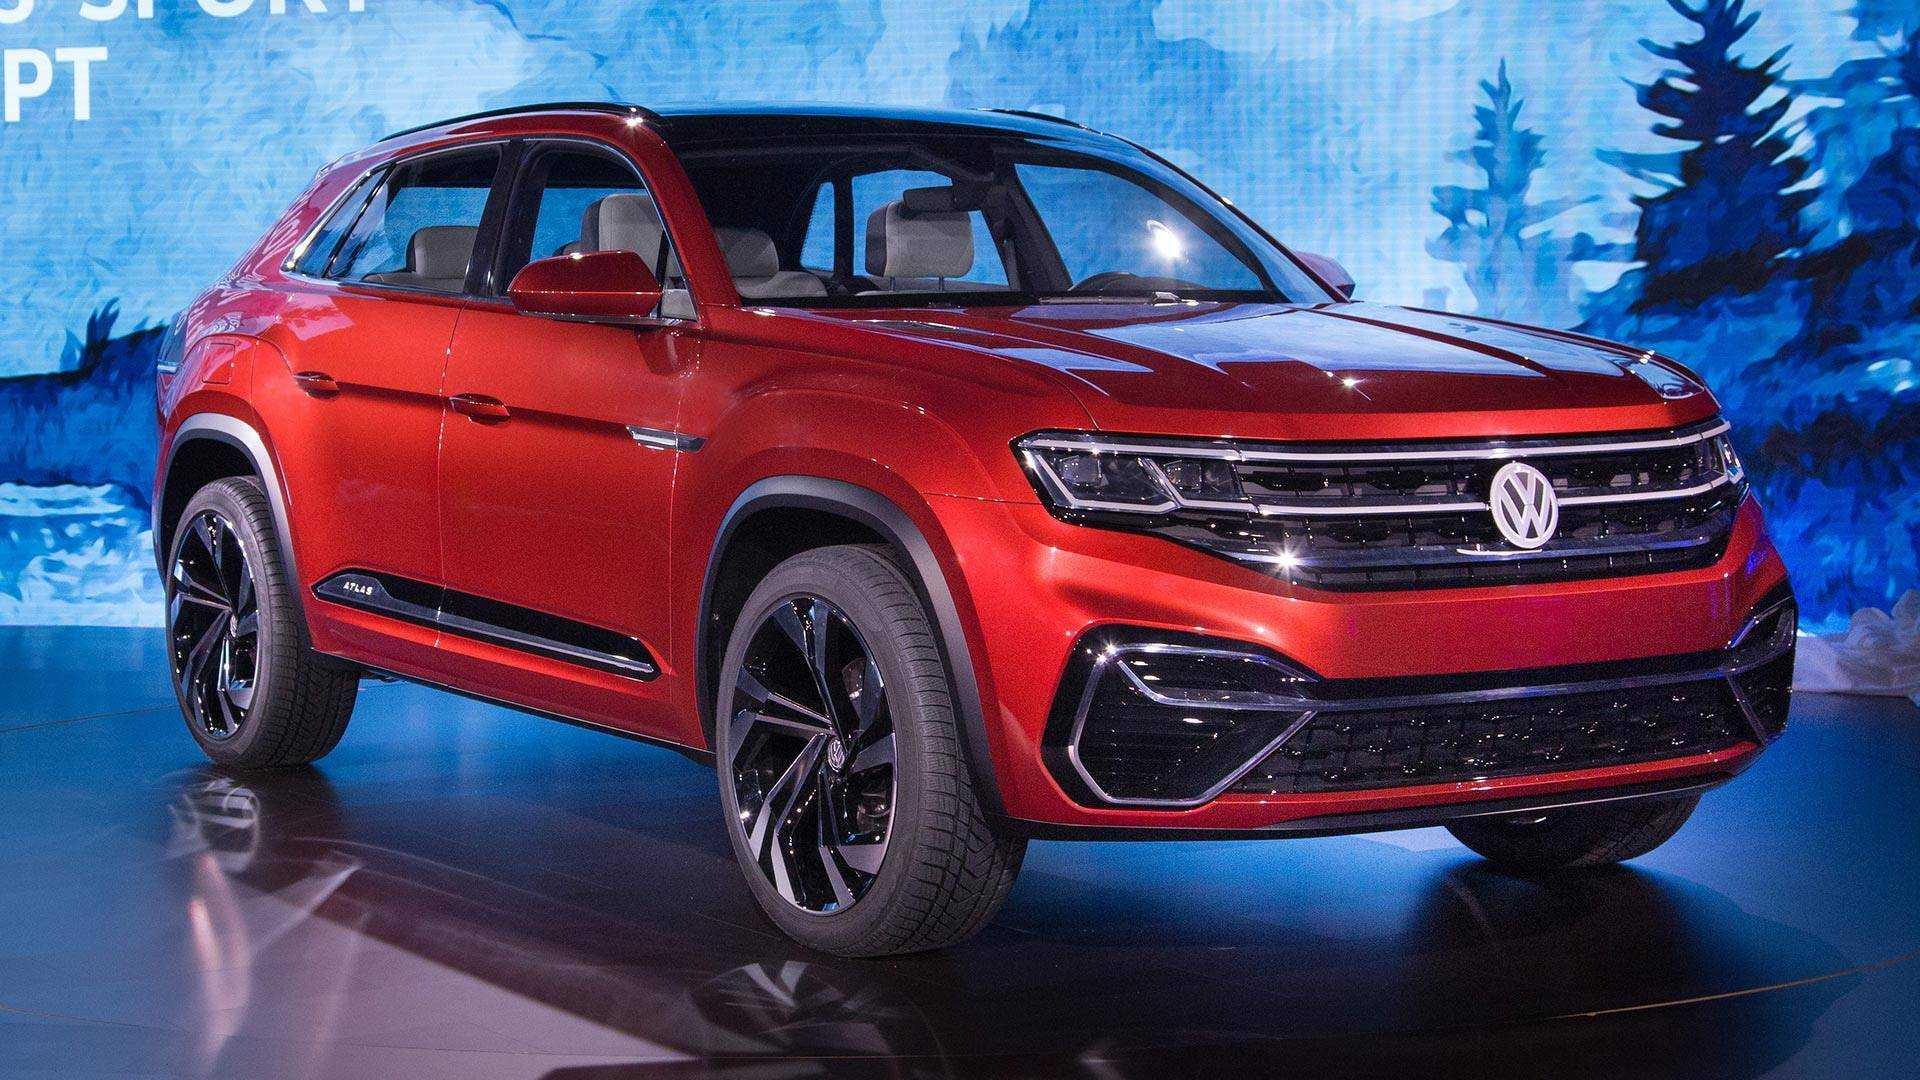 2018 VW Atlas R-Line: Styling, Interior, Arrival >> Volkswagen Atlas Cross Sport Concept Previews New Five Seat Suv